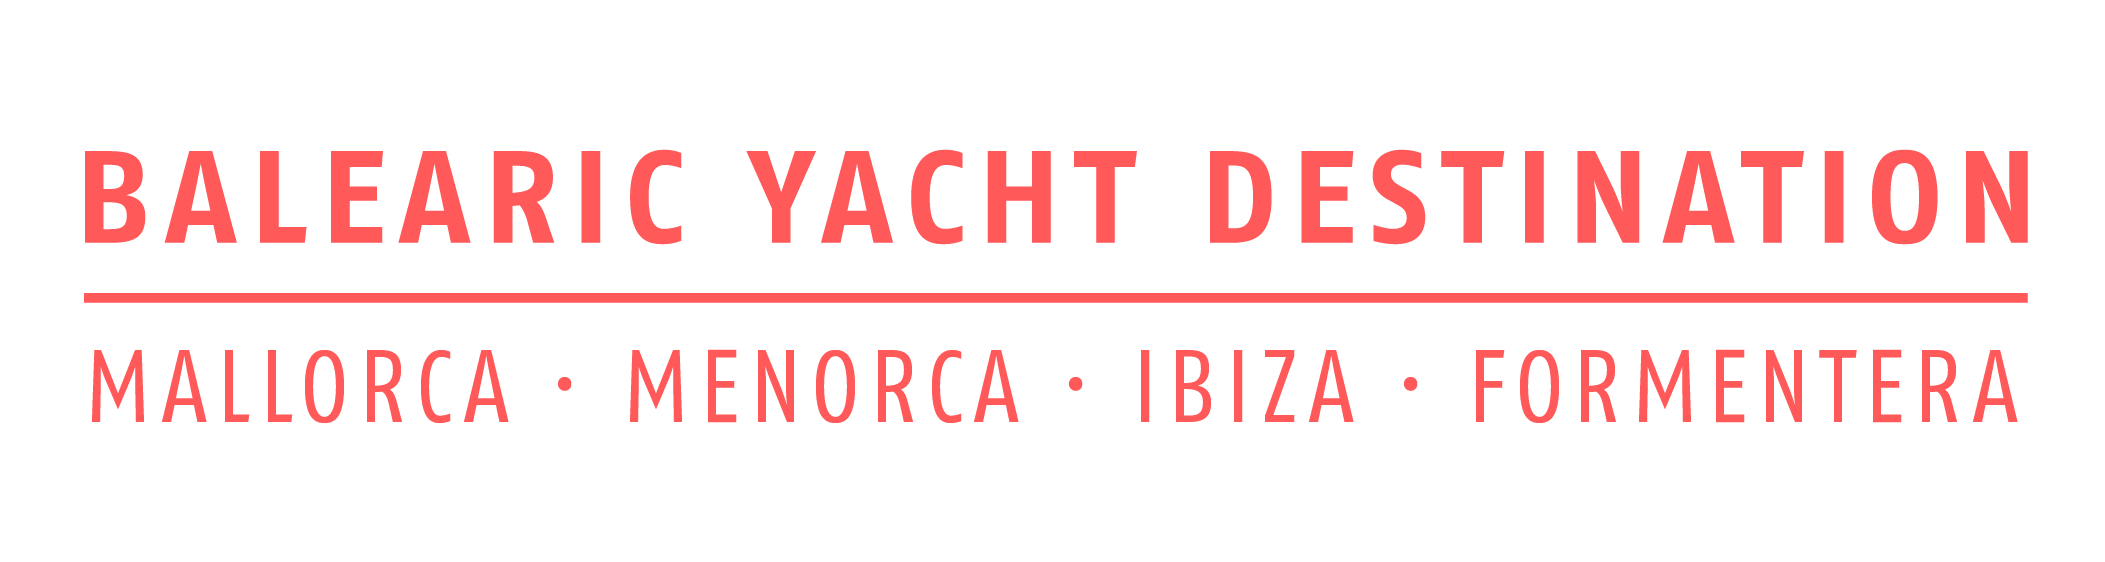 Resultado de imagen de Balearic Yacht destination logo